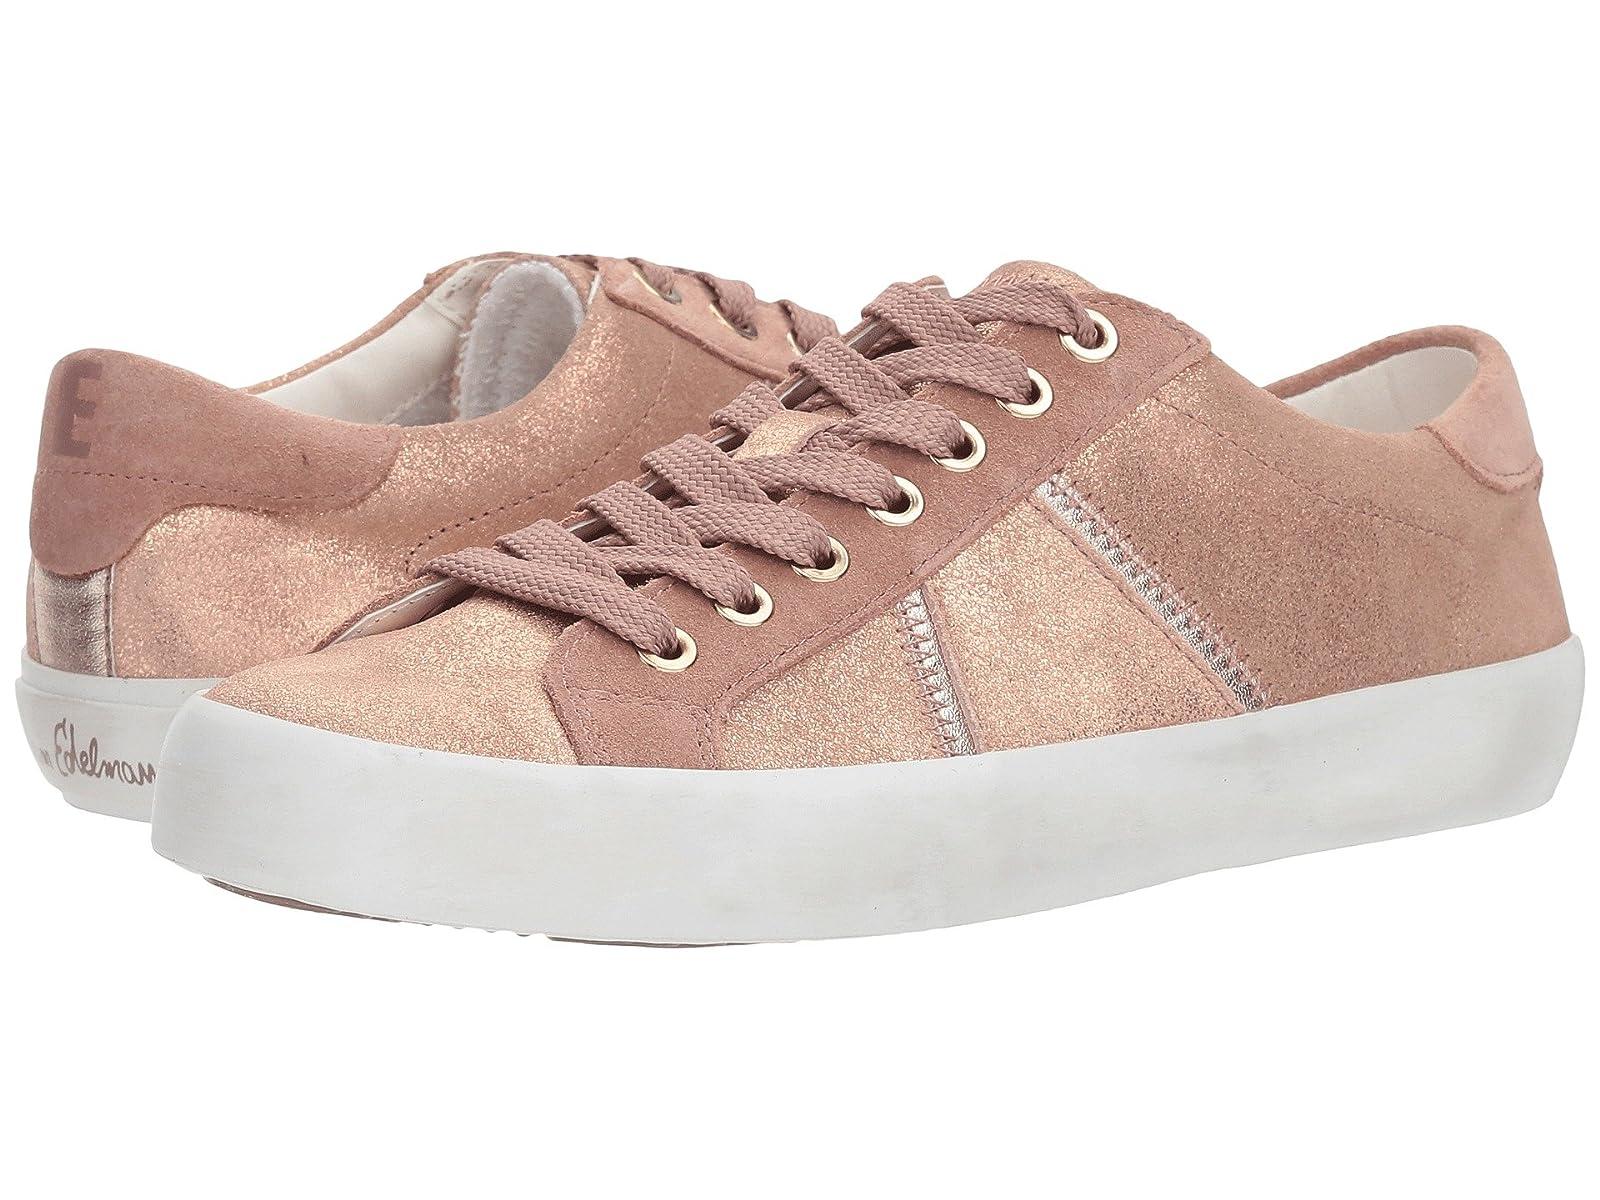 Sam Edelman BayleeCheap and distinctive eye-catching shoes